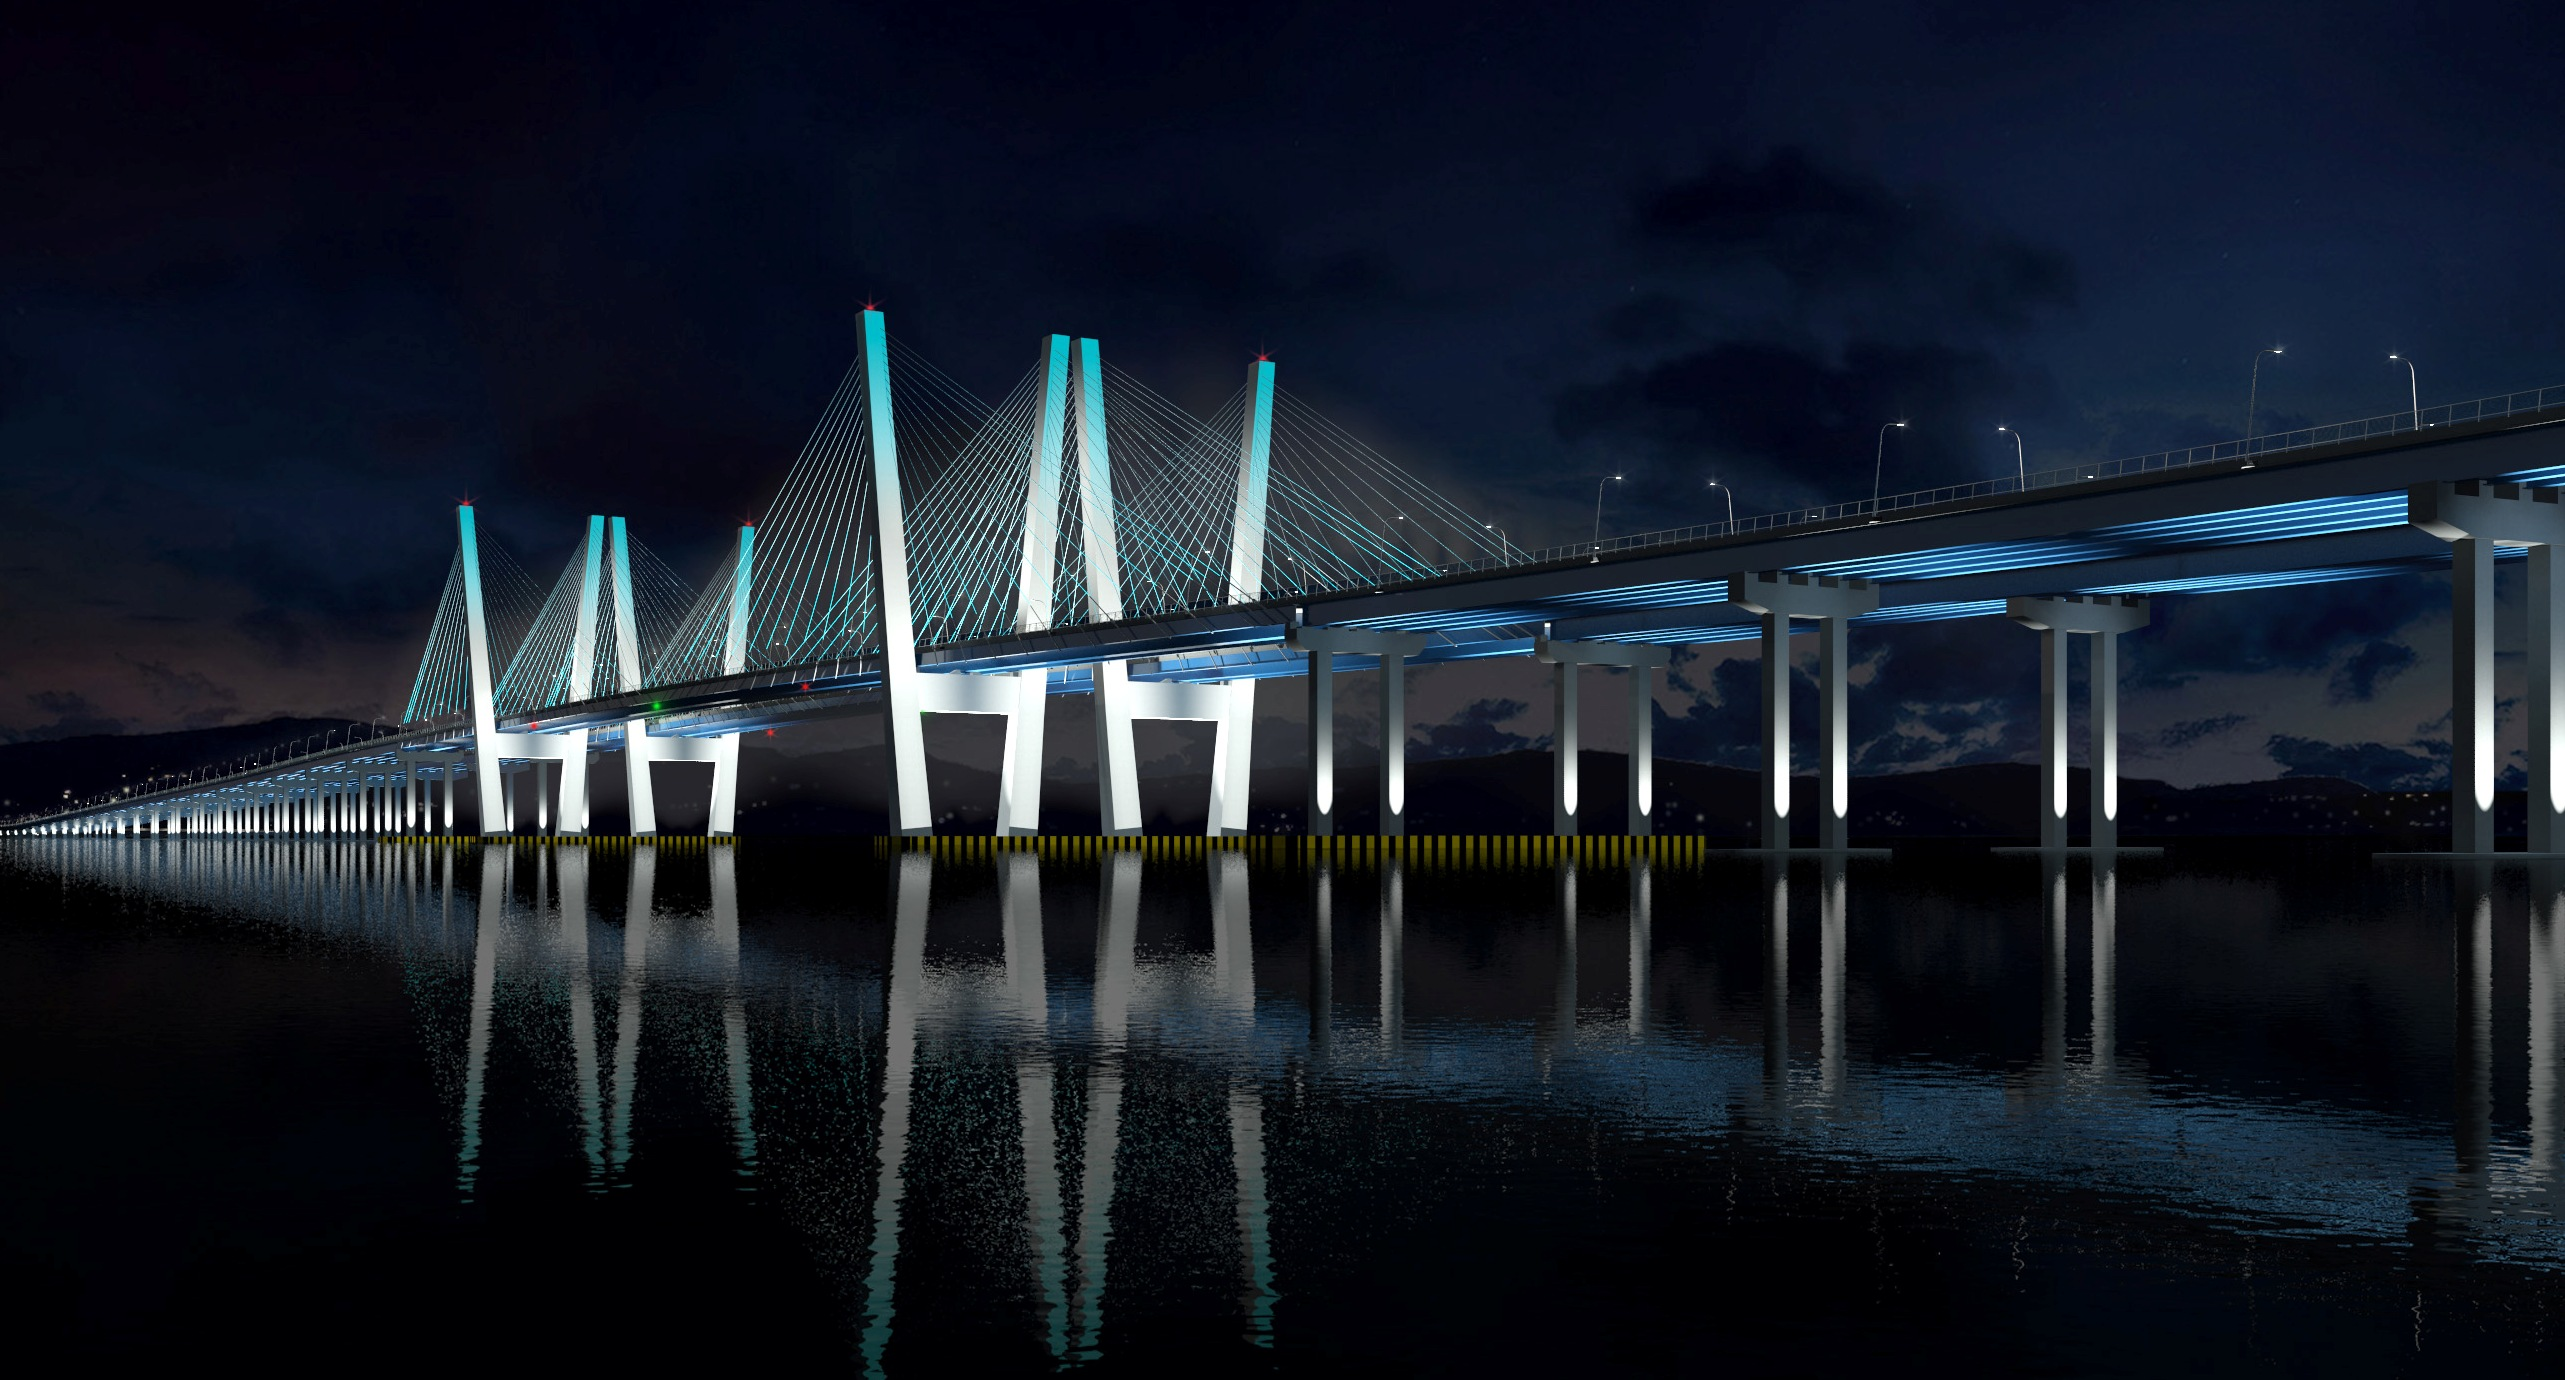 bridge architecture night - photo #32